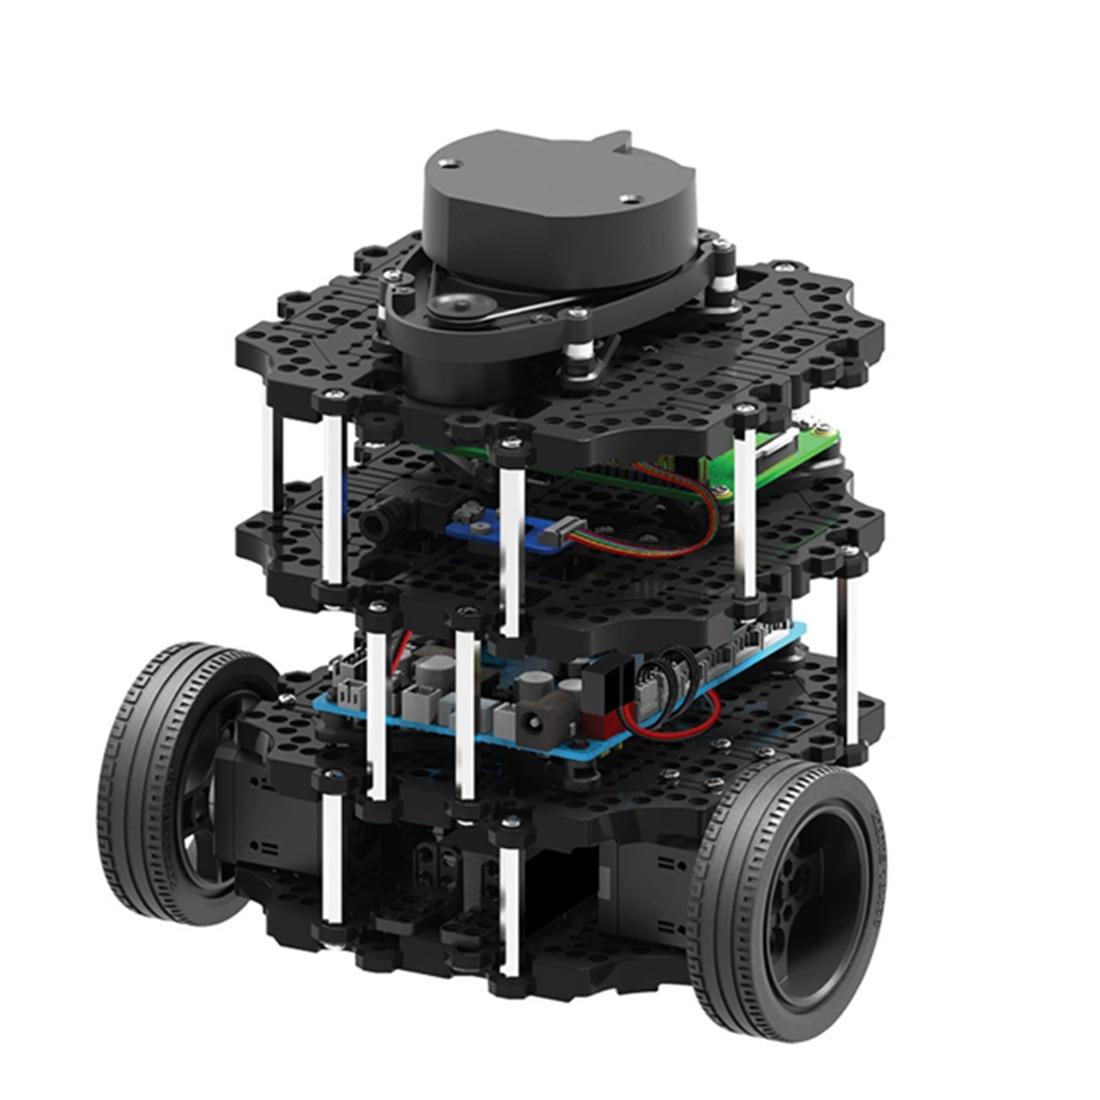 Robot Programmable ROS Pi3-Kit Car SLAM Turtlebot3-Burger Navigation Automatic Hot New